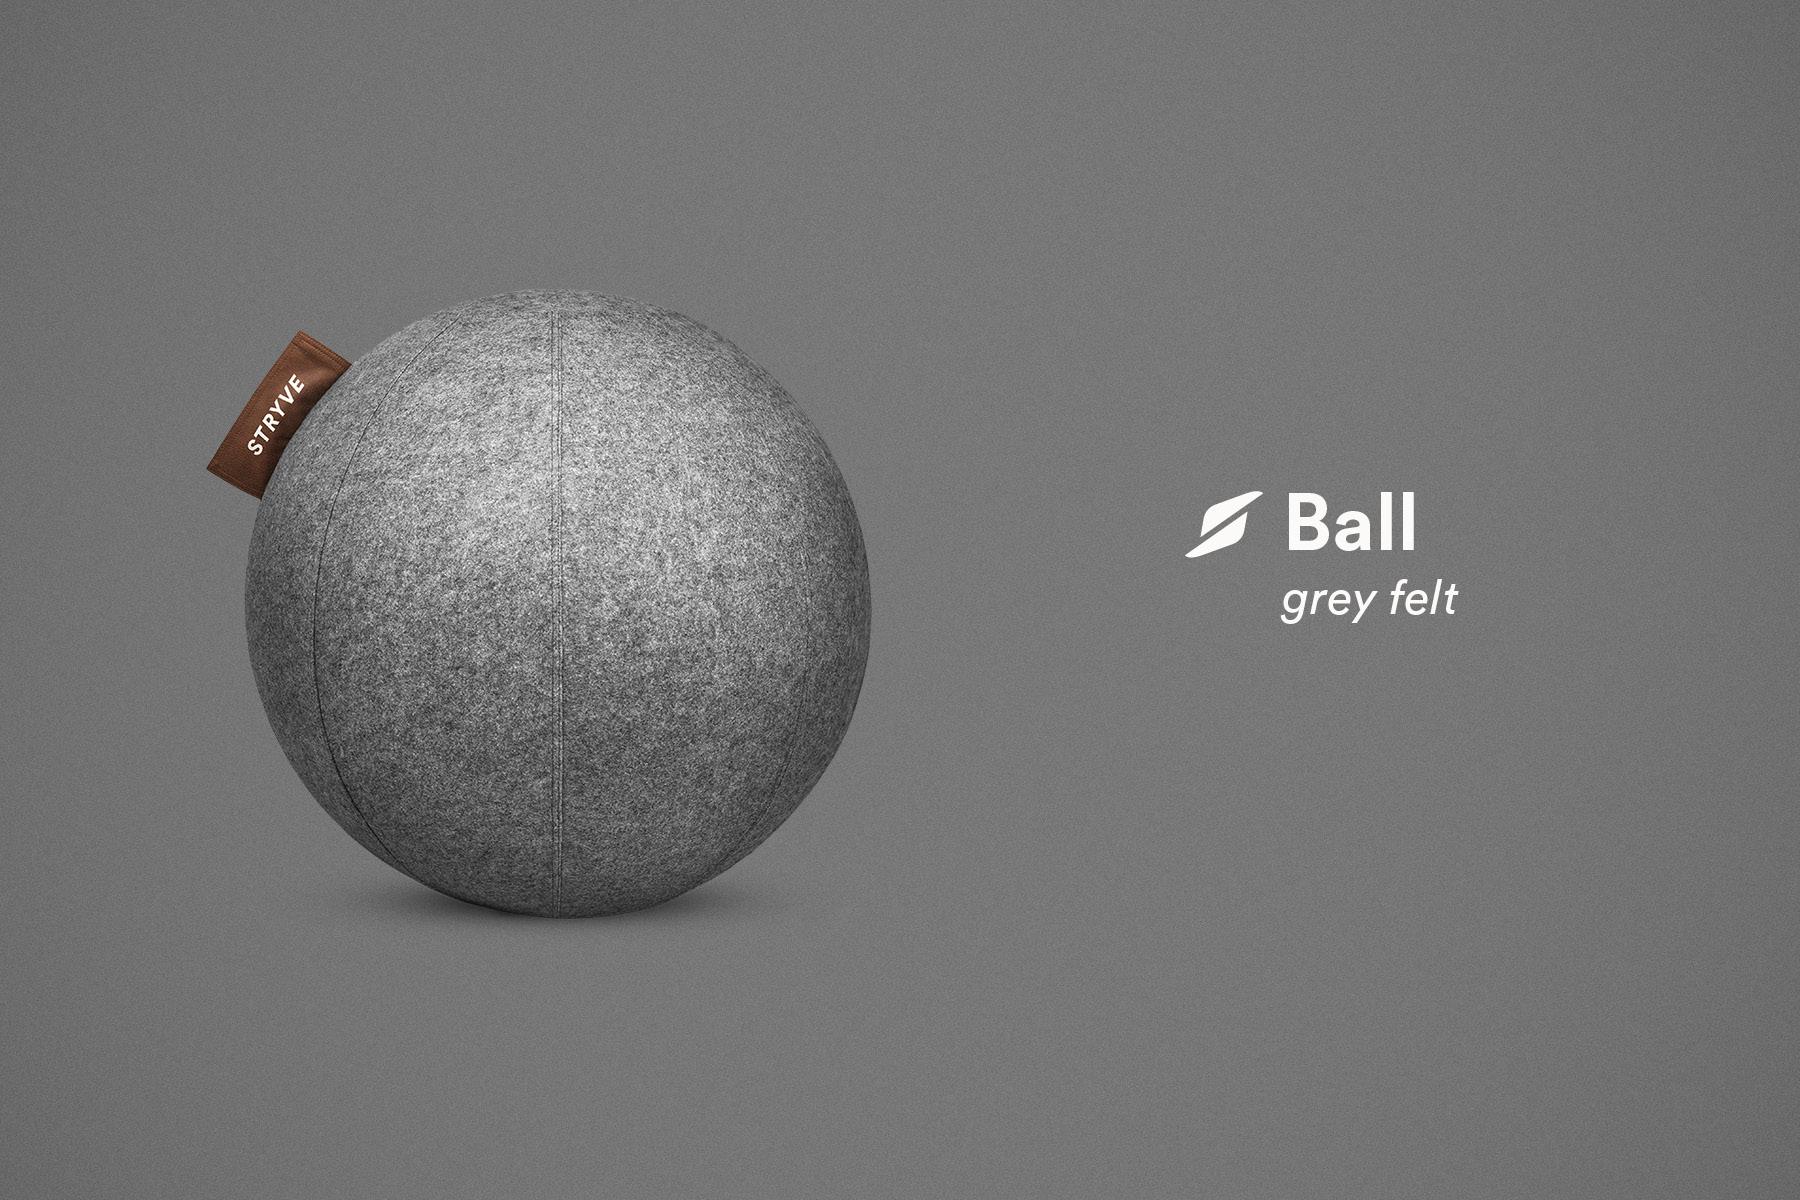 stryve-ball-beautiful-design-grafik-kommunikation